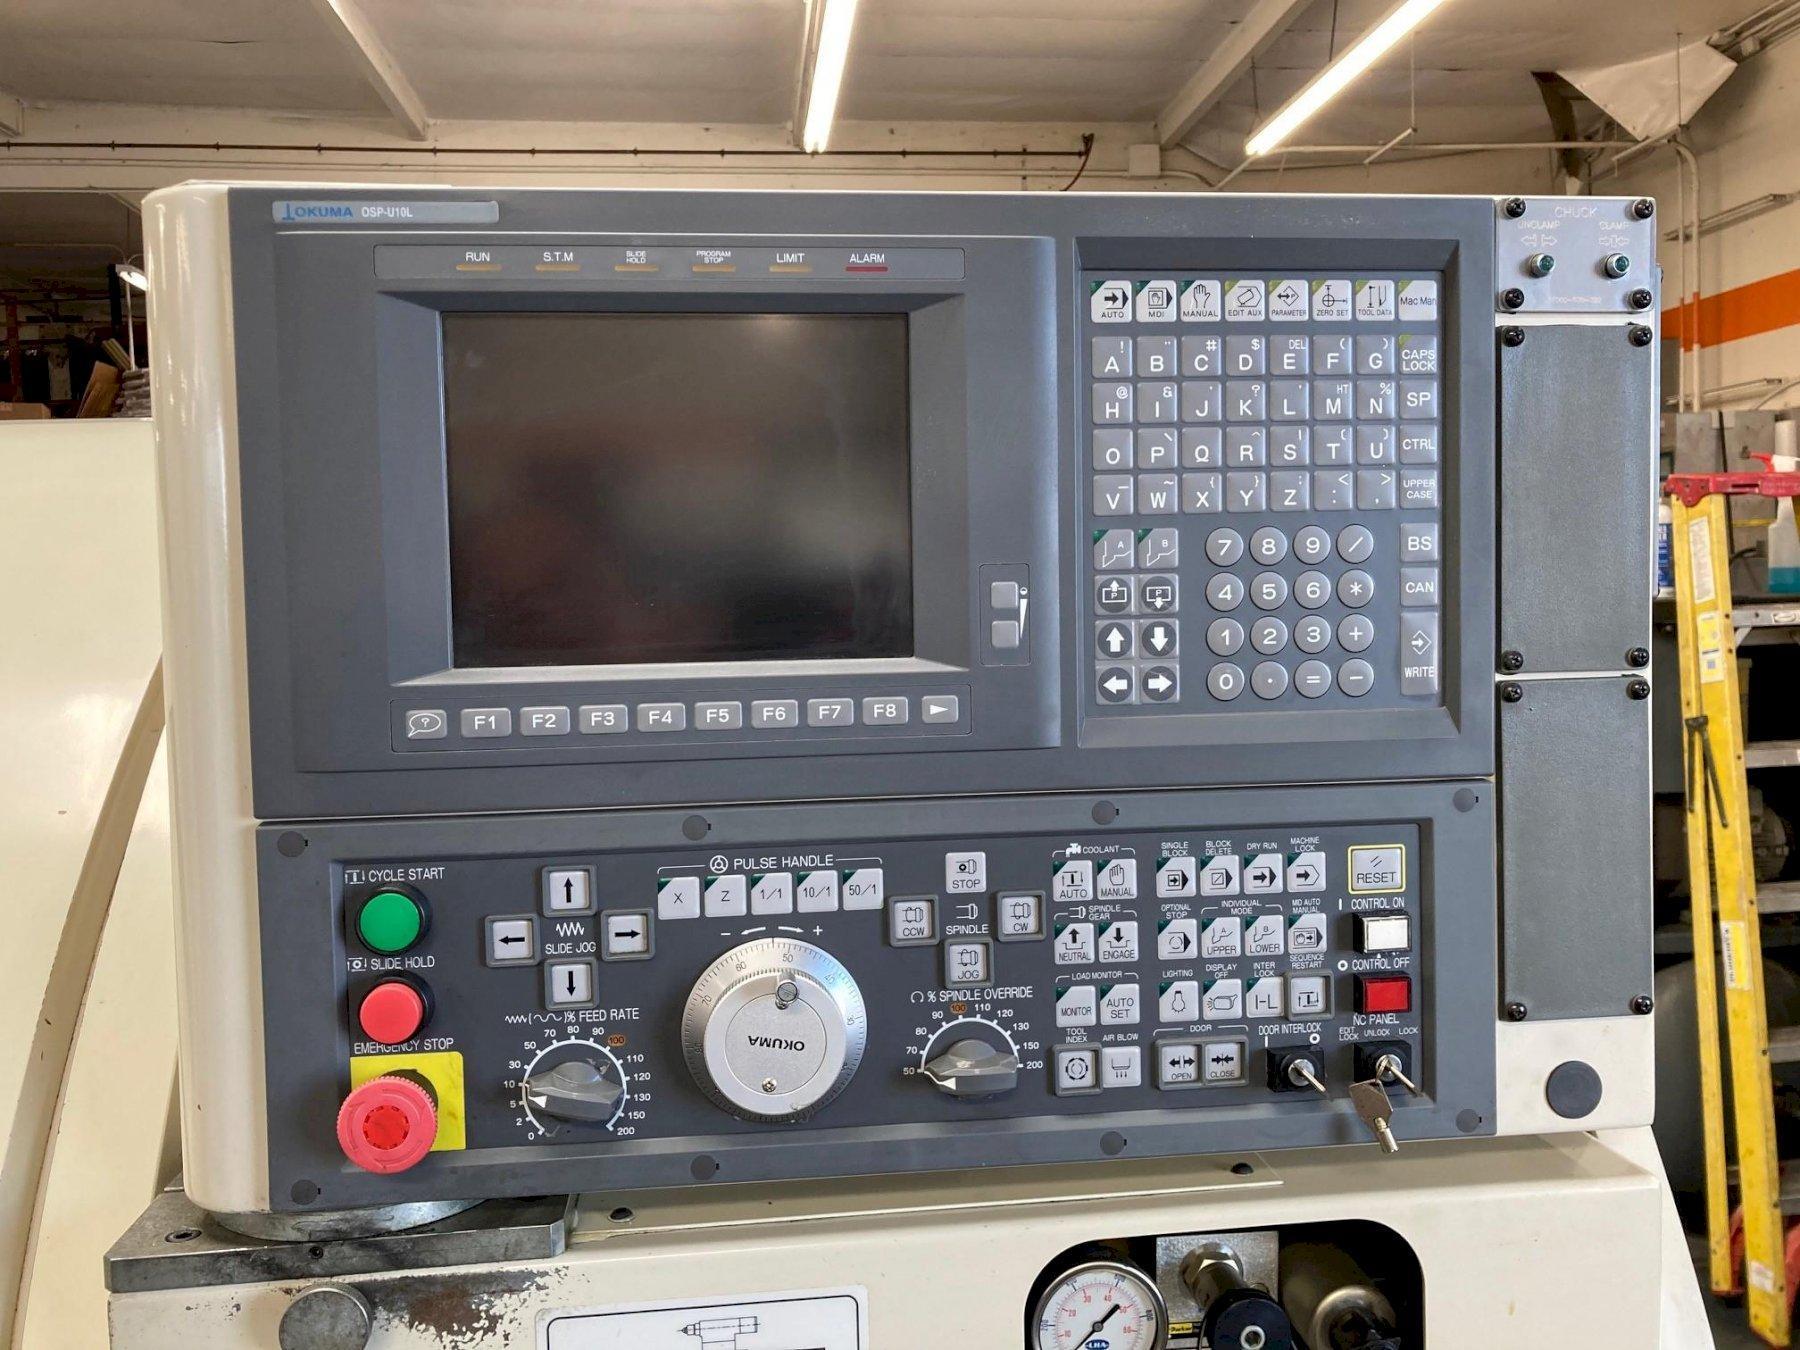 Okuma Crown L1060 CNC Lathe 2000 with: Okuma OSP-U10L CNC Control, Tailstock, Chip Conveyor, and Manuals.